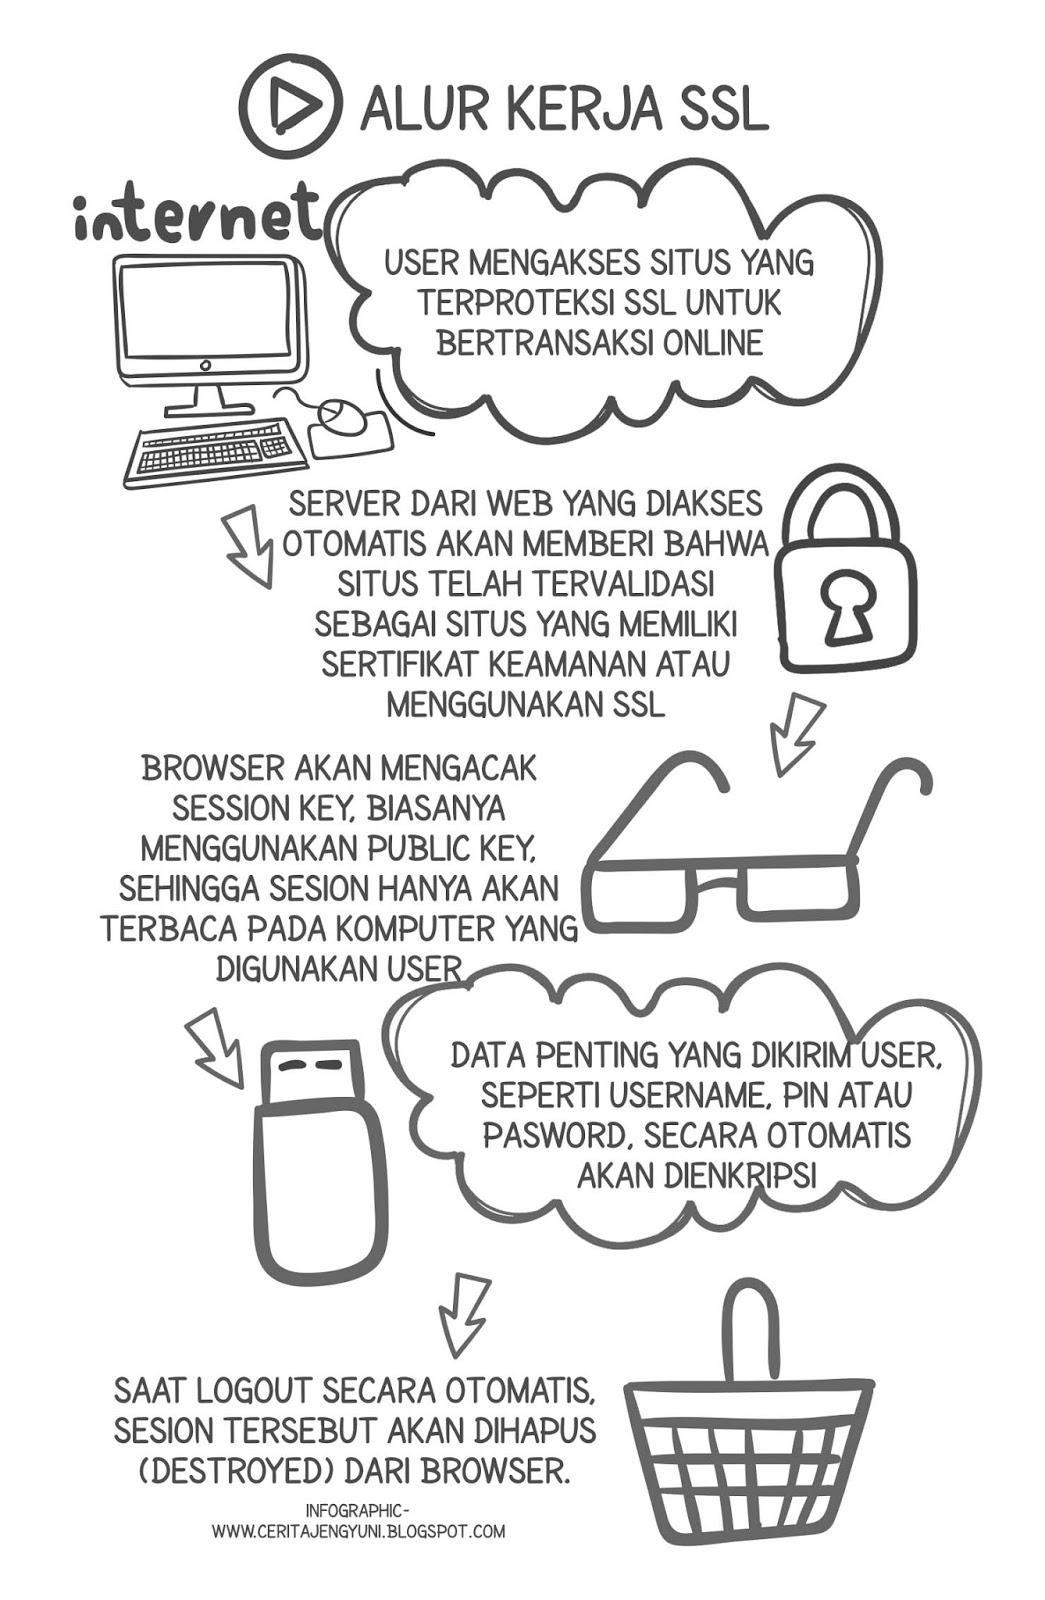 Alur Kerja SSL